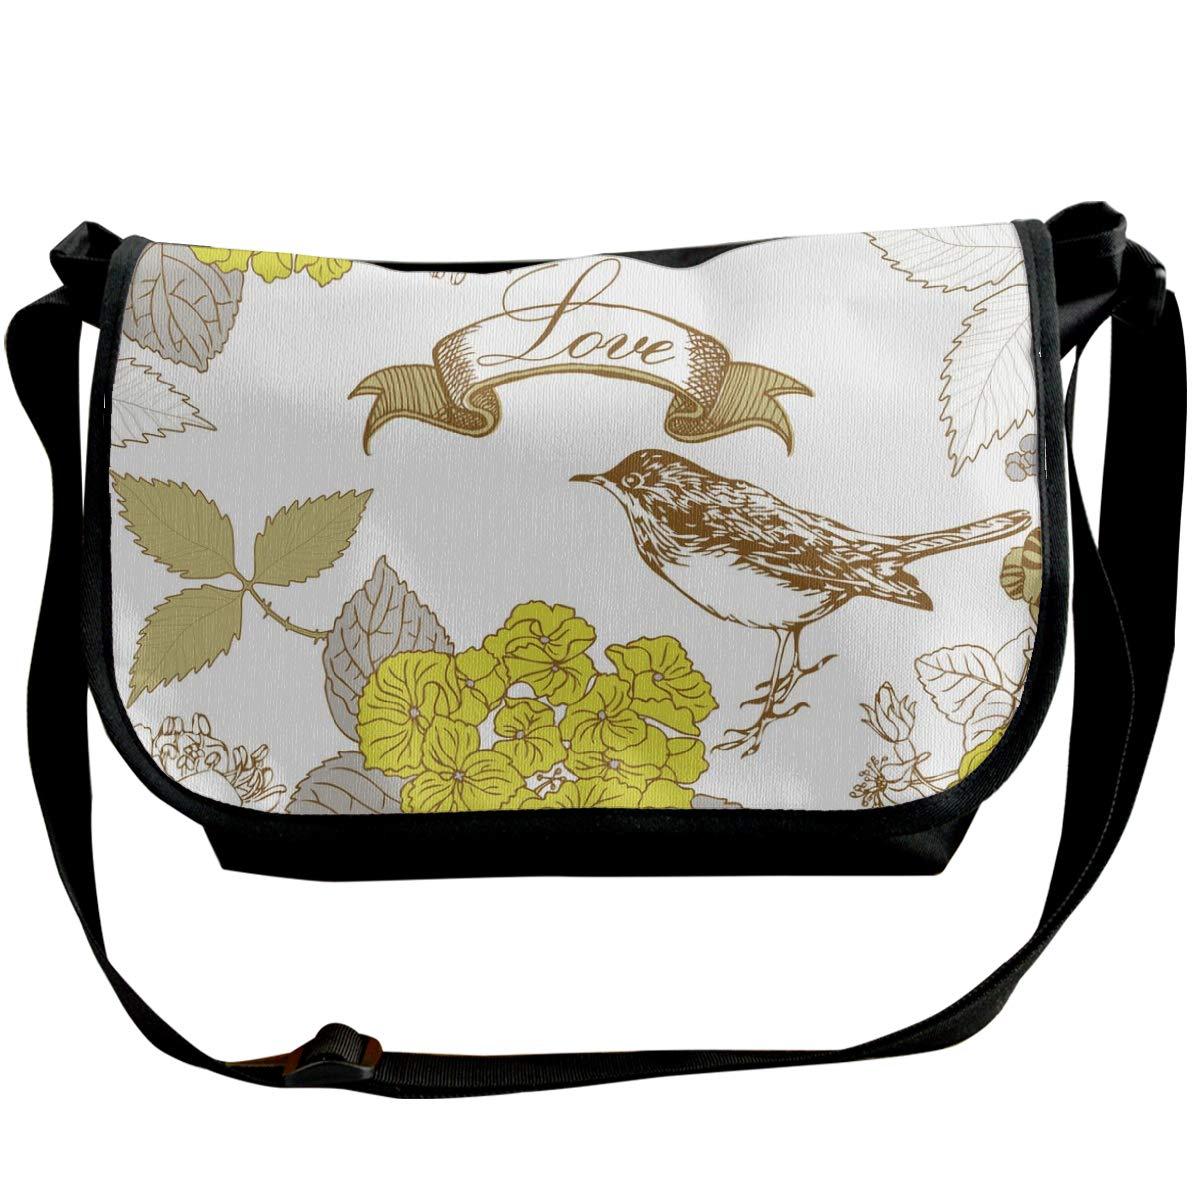 Taslilye Vintage Love Birds Pattern Vector Image Customized Wide Crossbody Shoulder Bag For Men And Women For Daily Work Or Travel